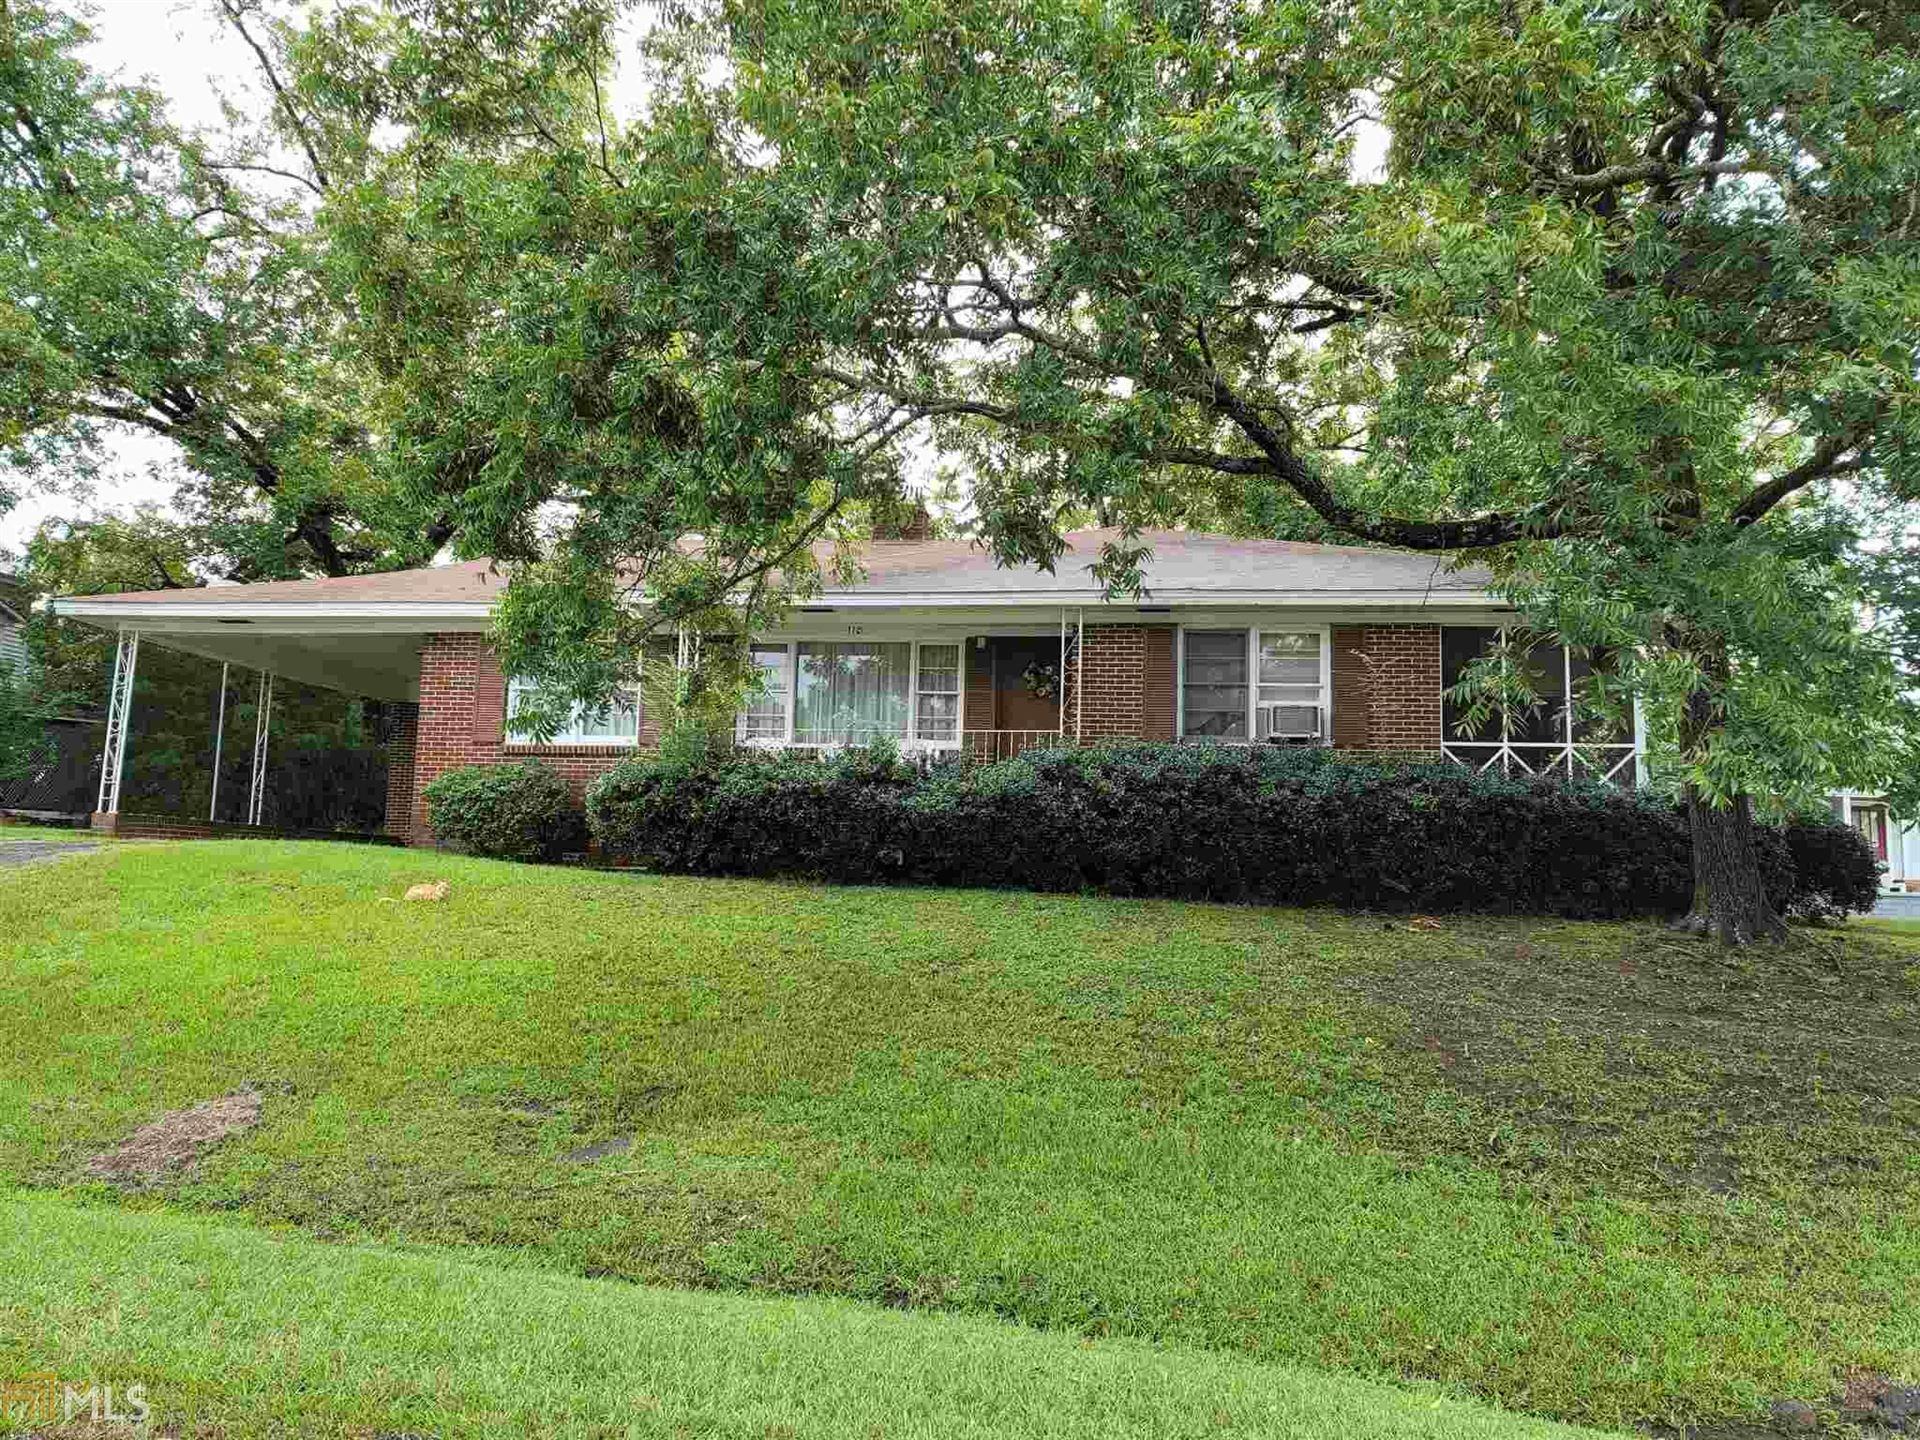 118 Alexander St, Crawfordville, GA 30631 - MLS#: 8864143